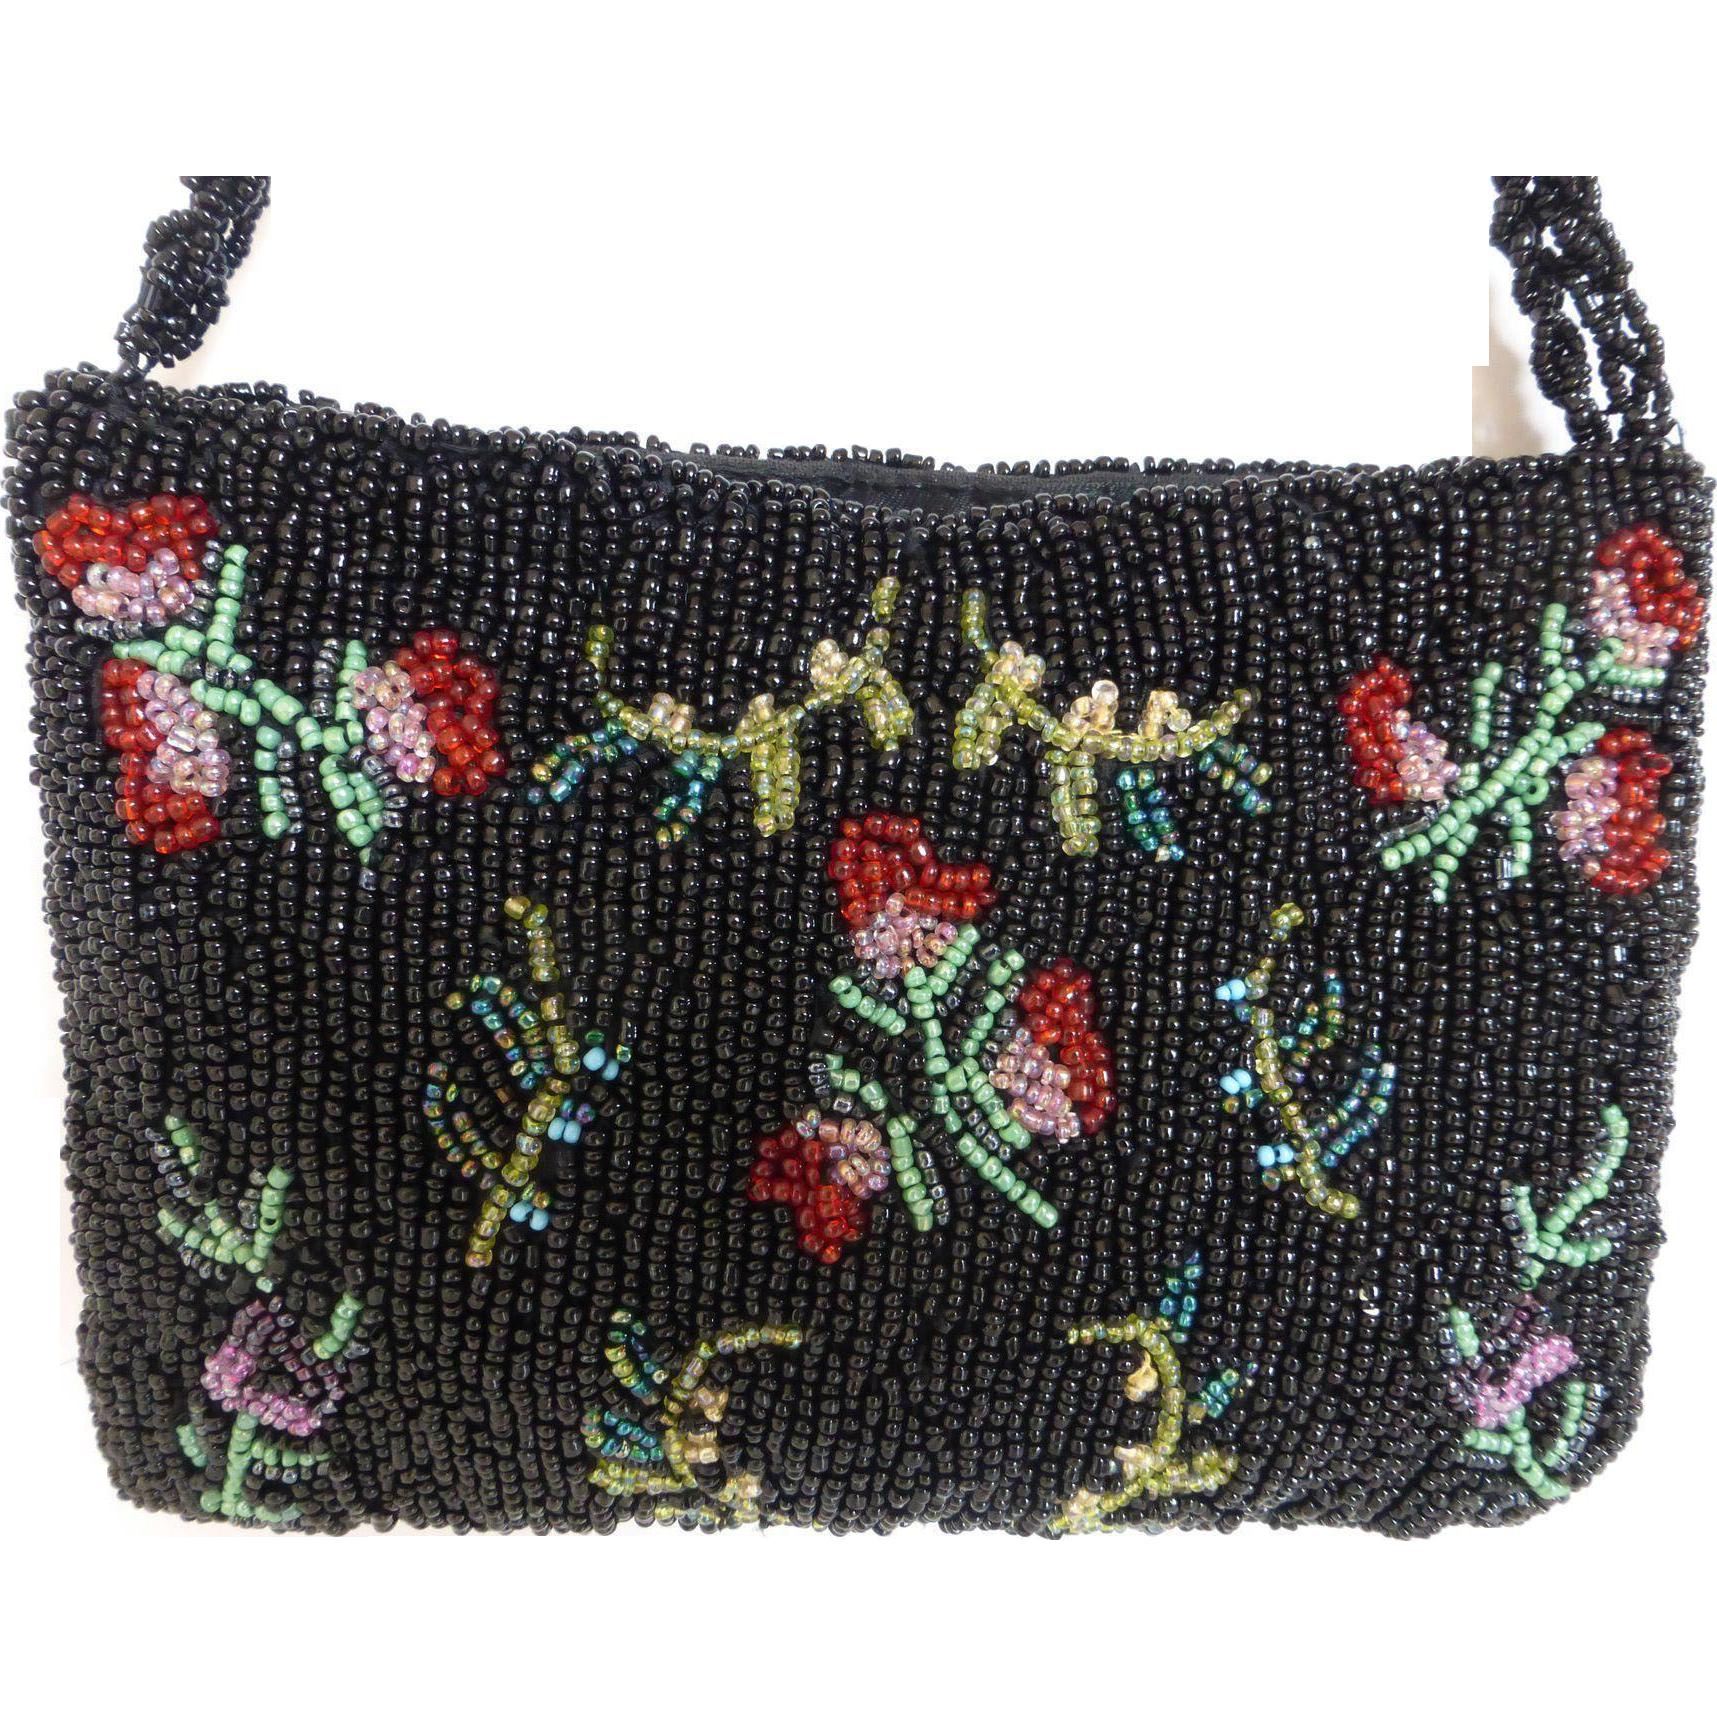 Lovely A Beaded Handbag Purse Multi Colored Historique Ruby Lane